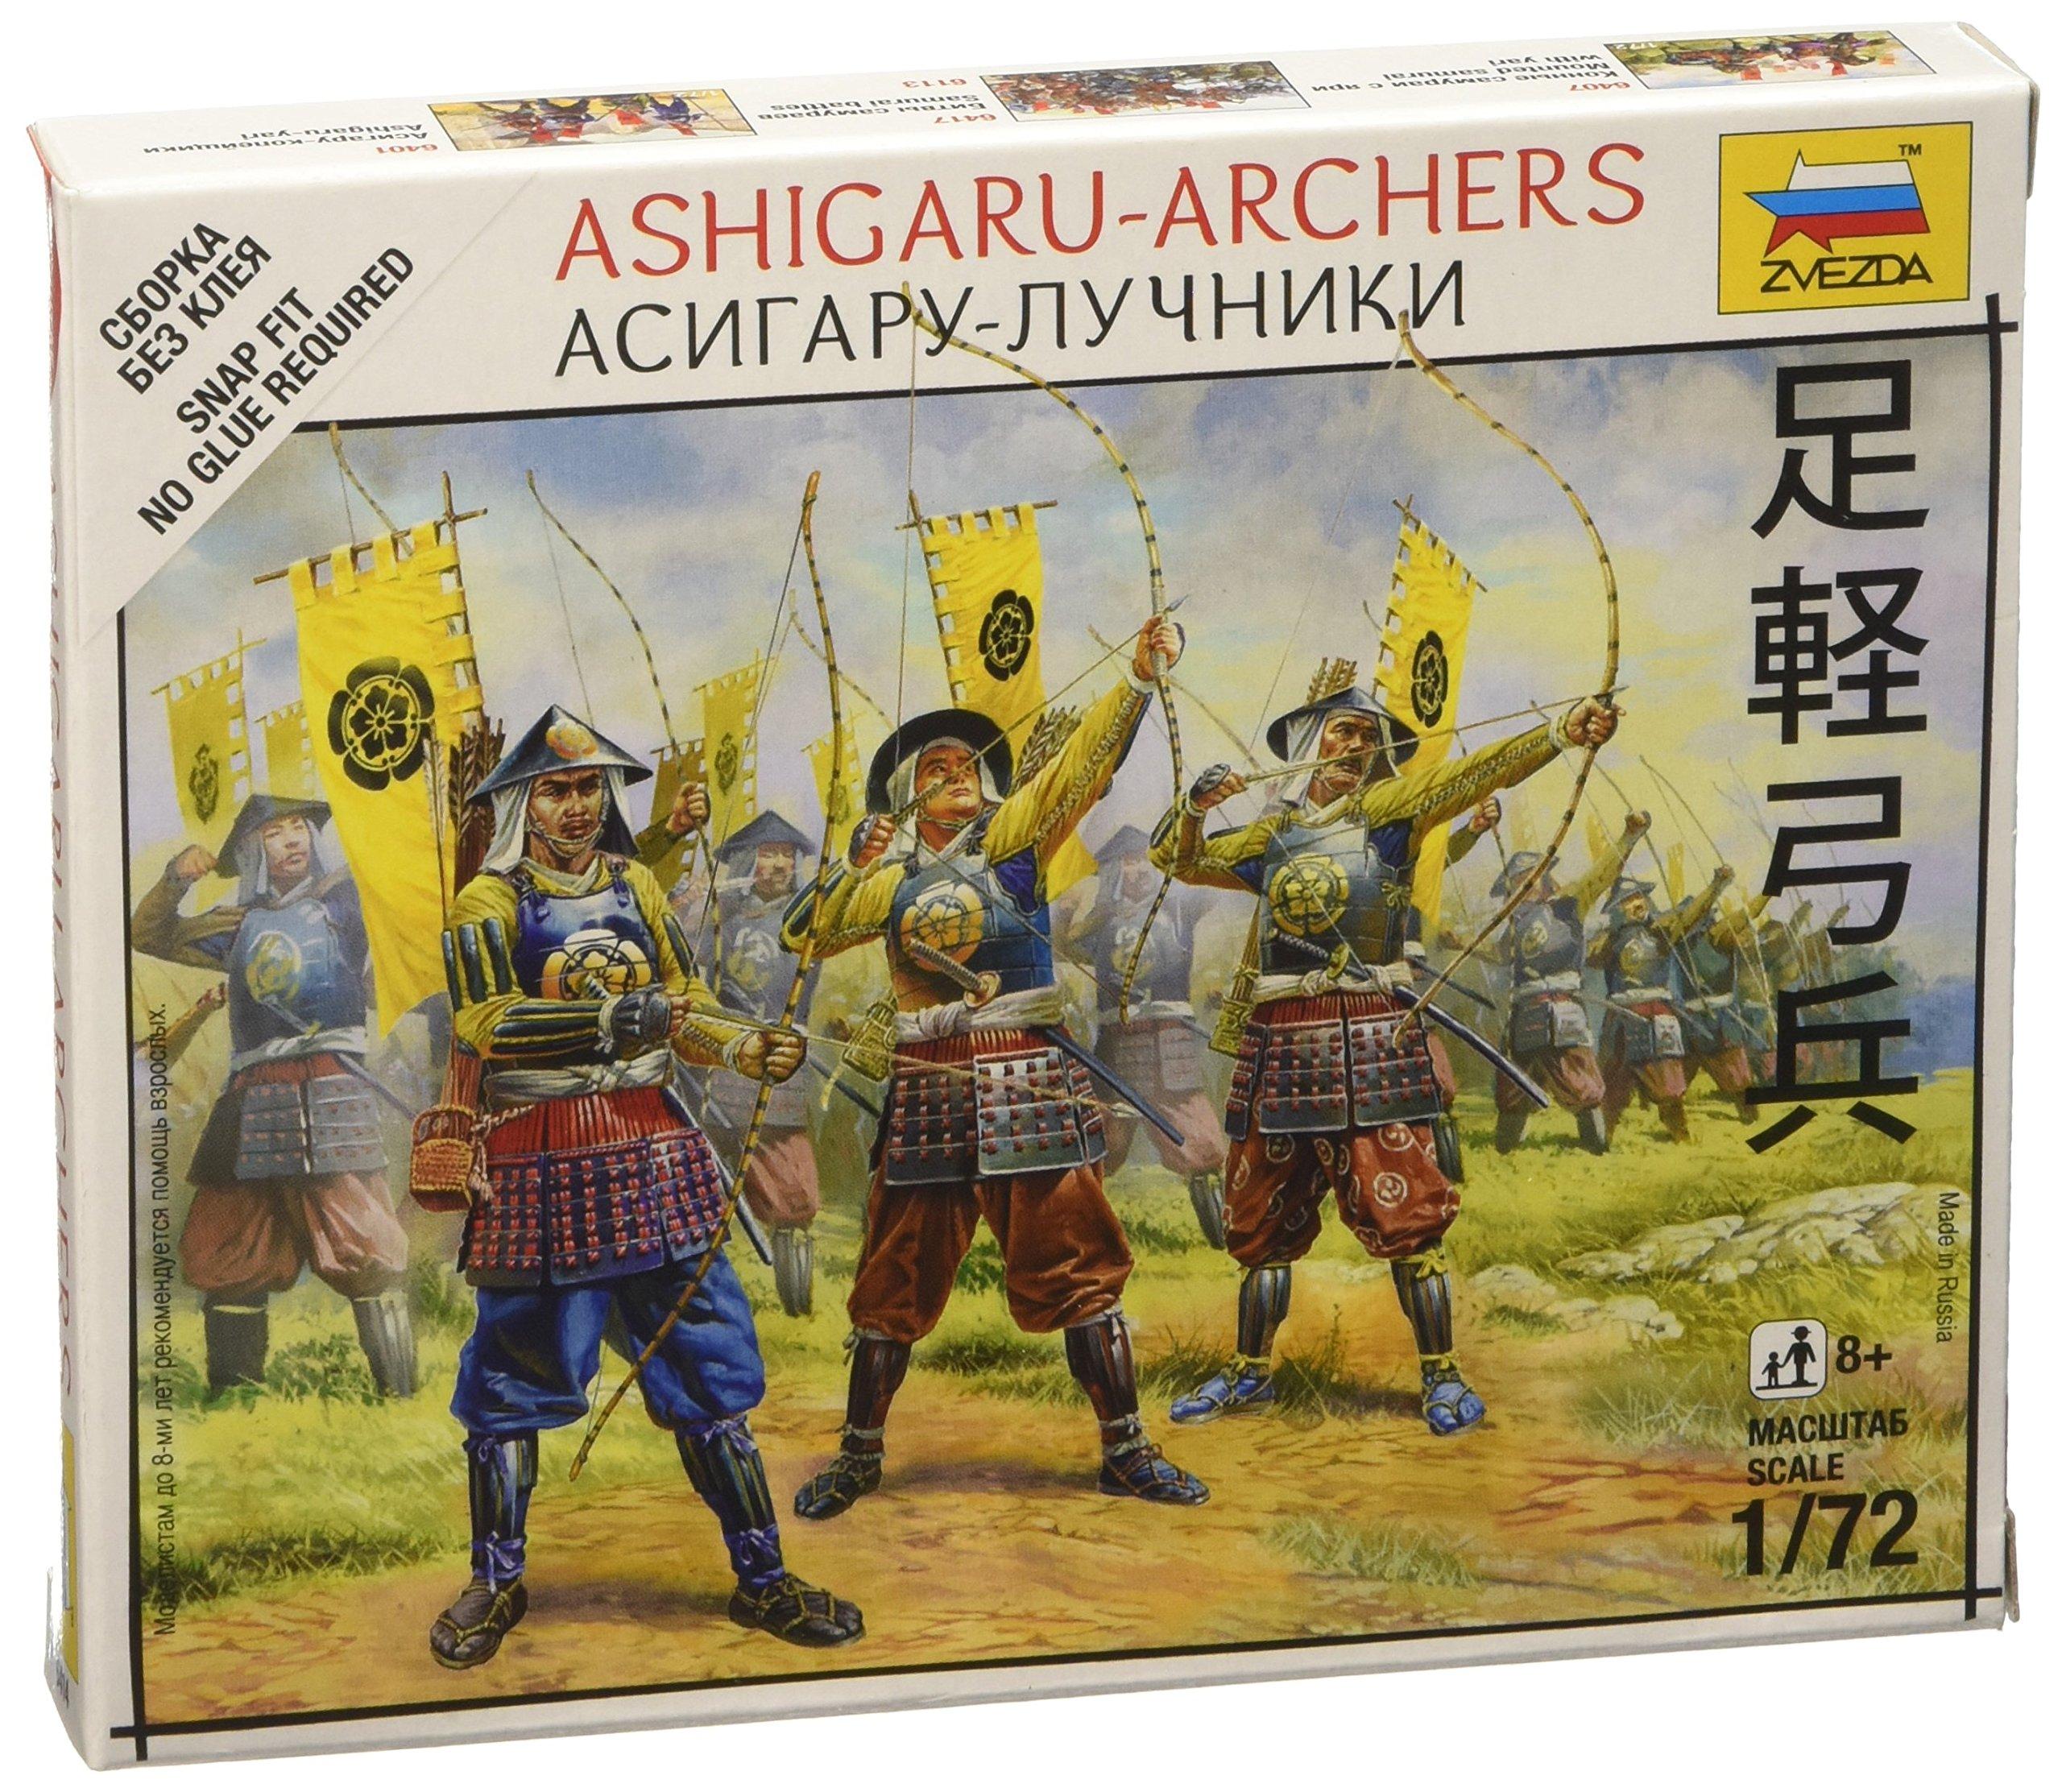 ZVEZDA 8017 Infantry Plastic Soldiers Samurai Army Scale 1:72 44 Figures 1